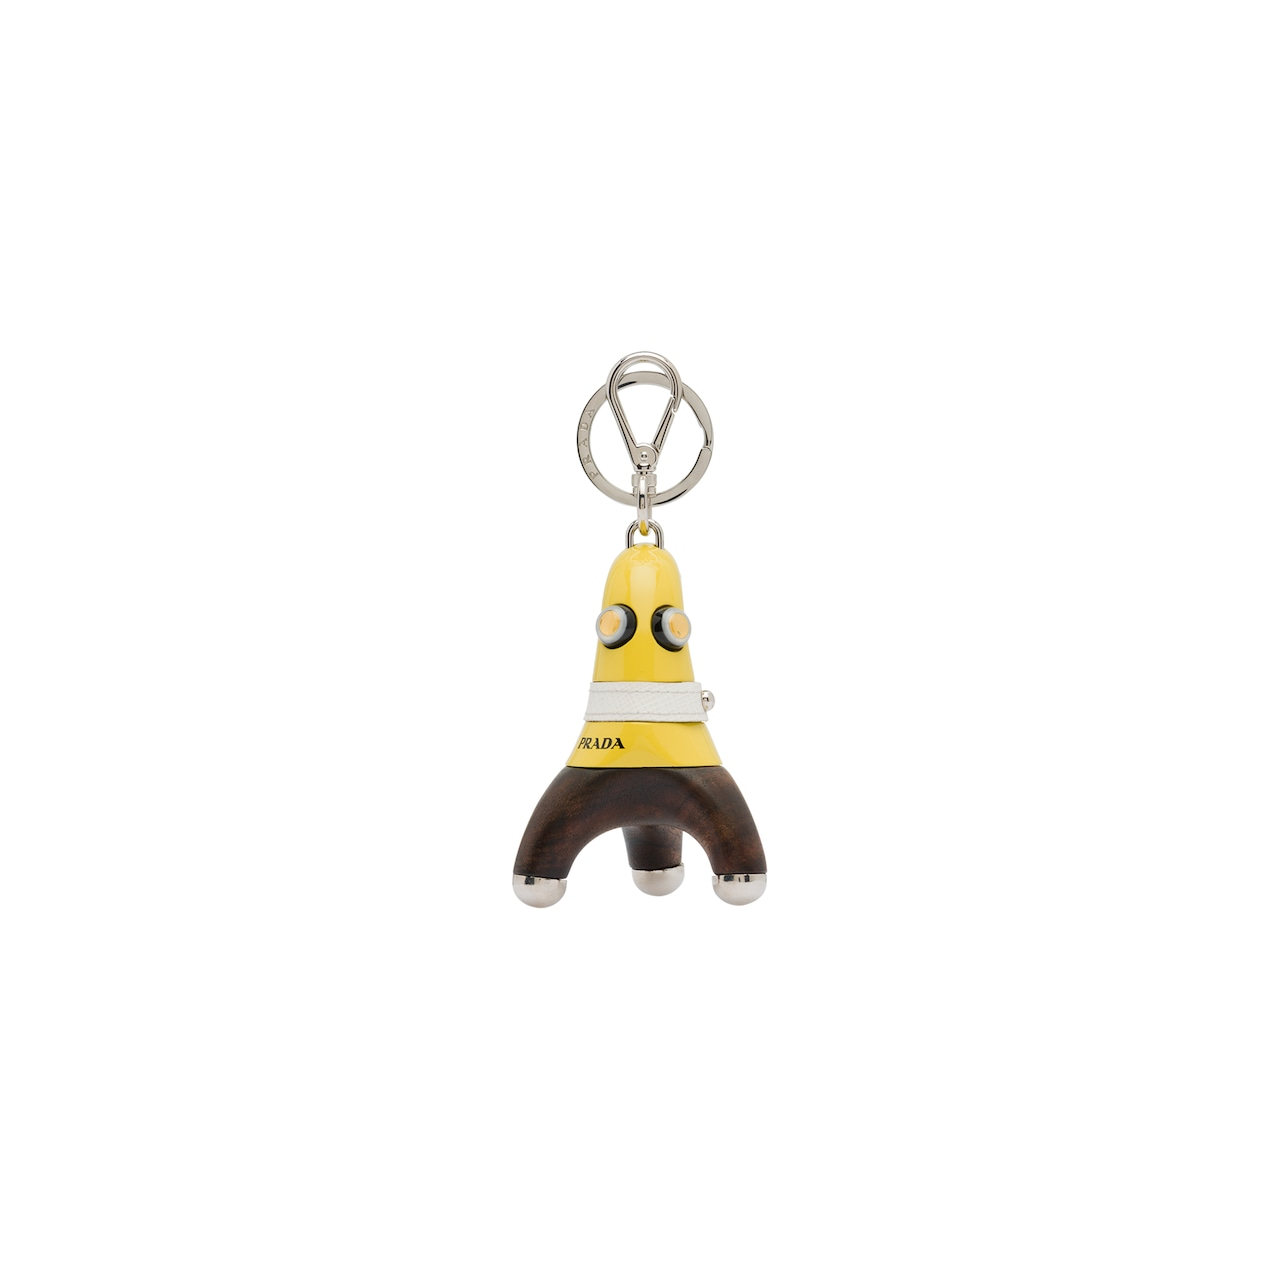 Pradamalia Fiddle-Schlüsselanhänger